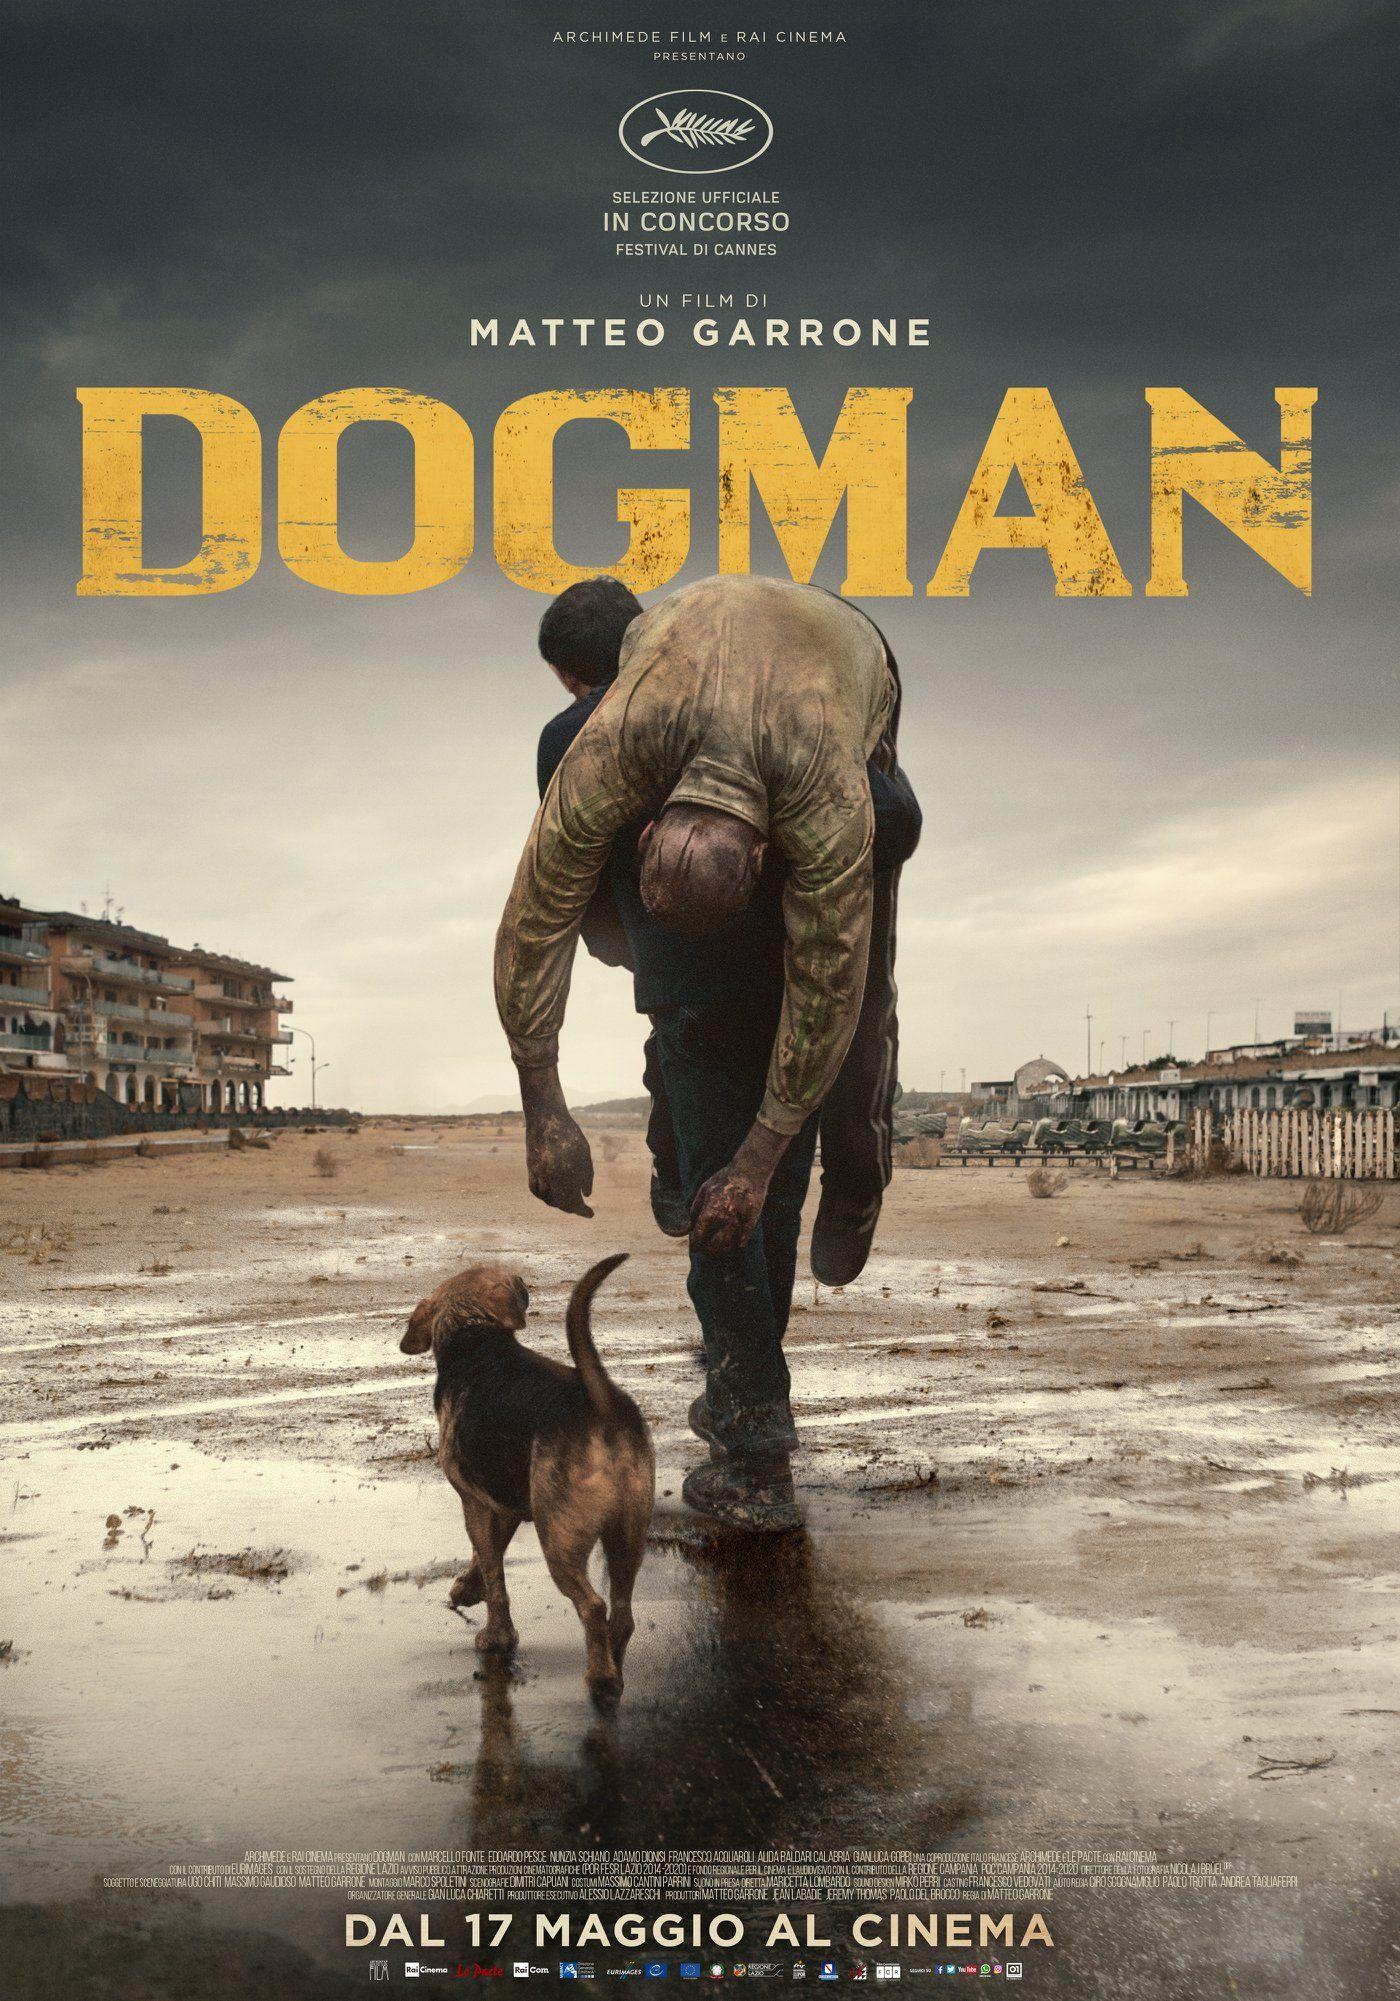 Dogman (2018-Italy) dir. Matteo Garrone